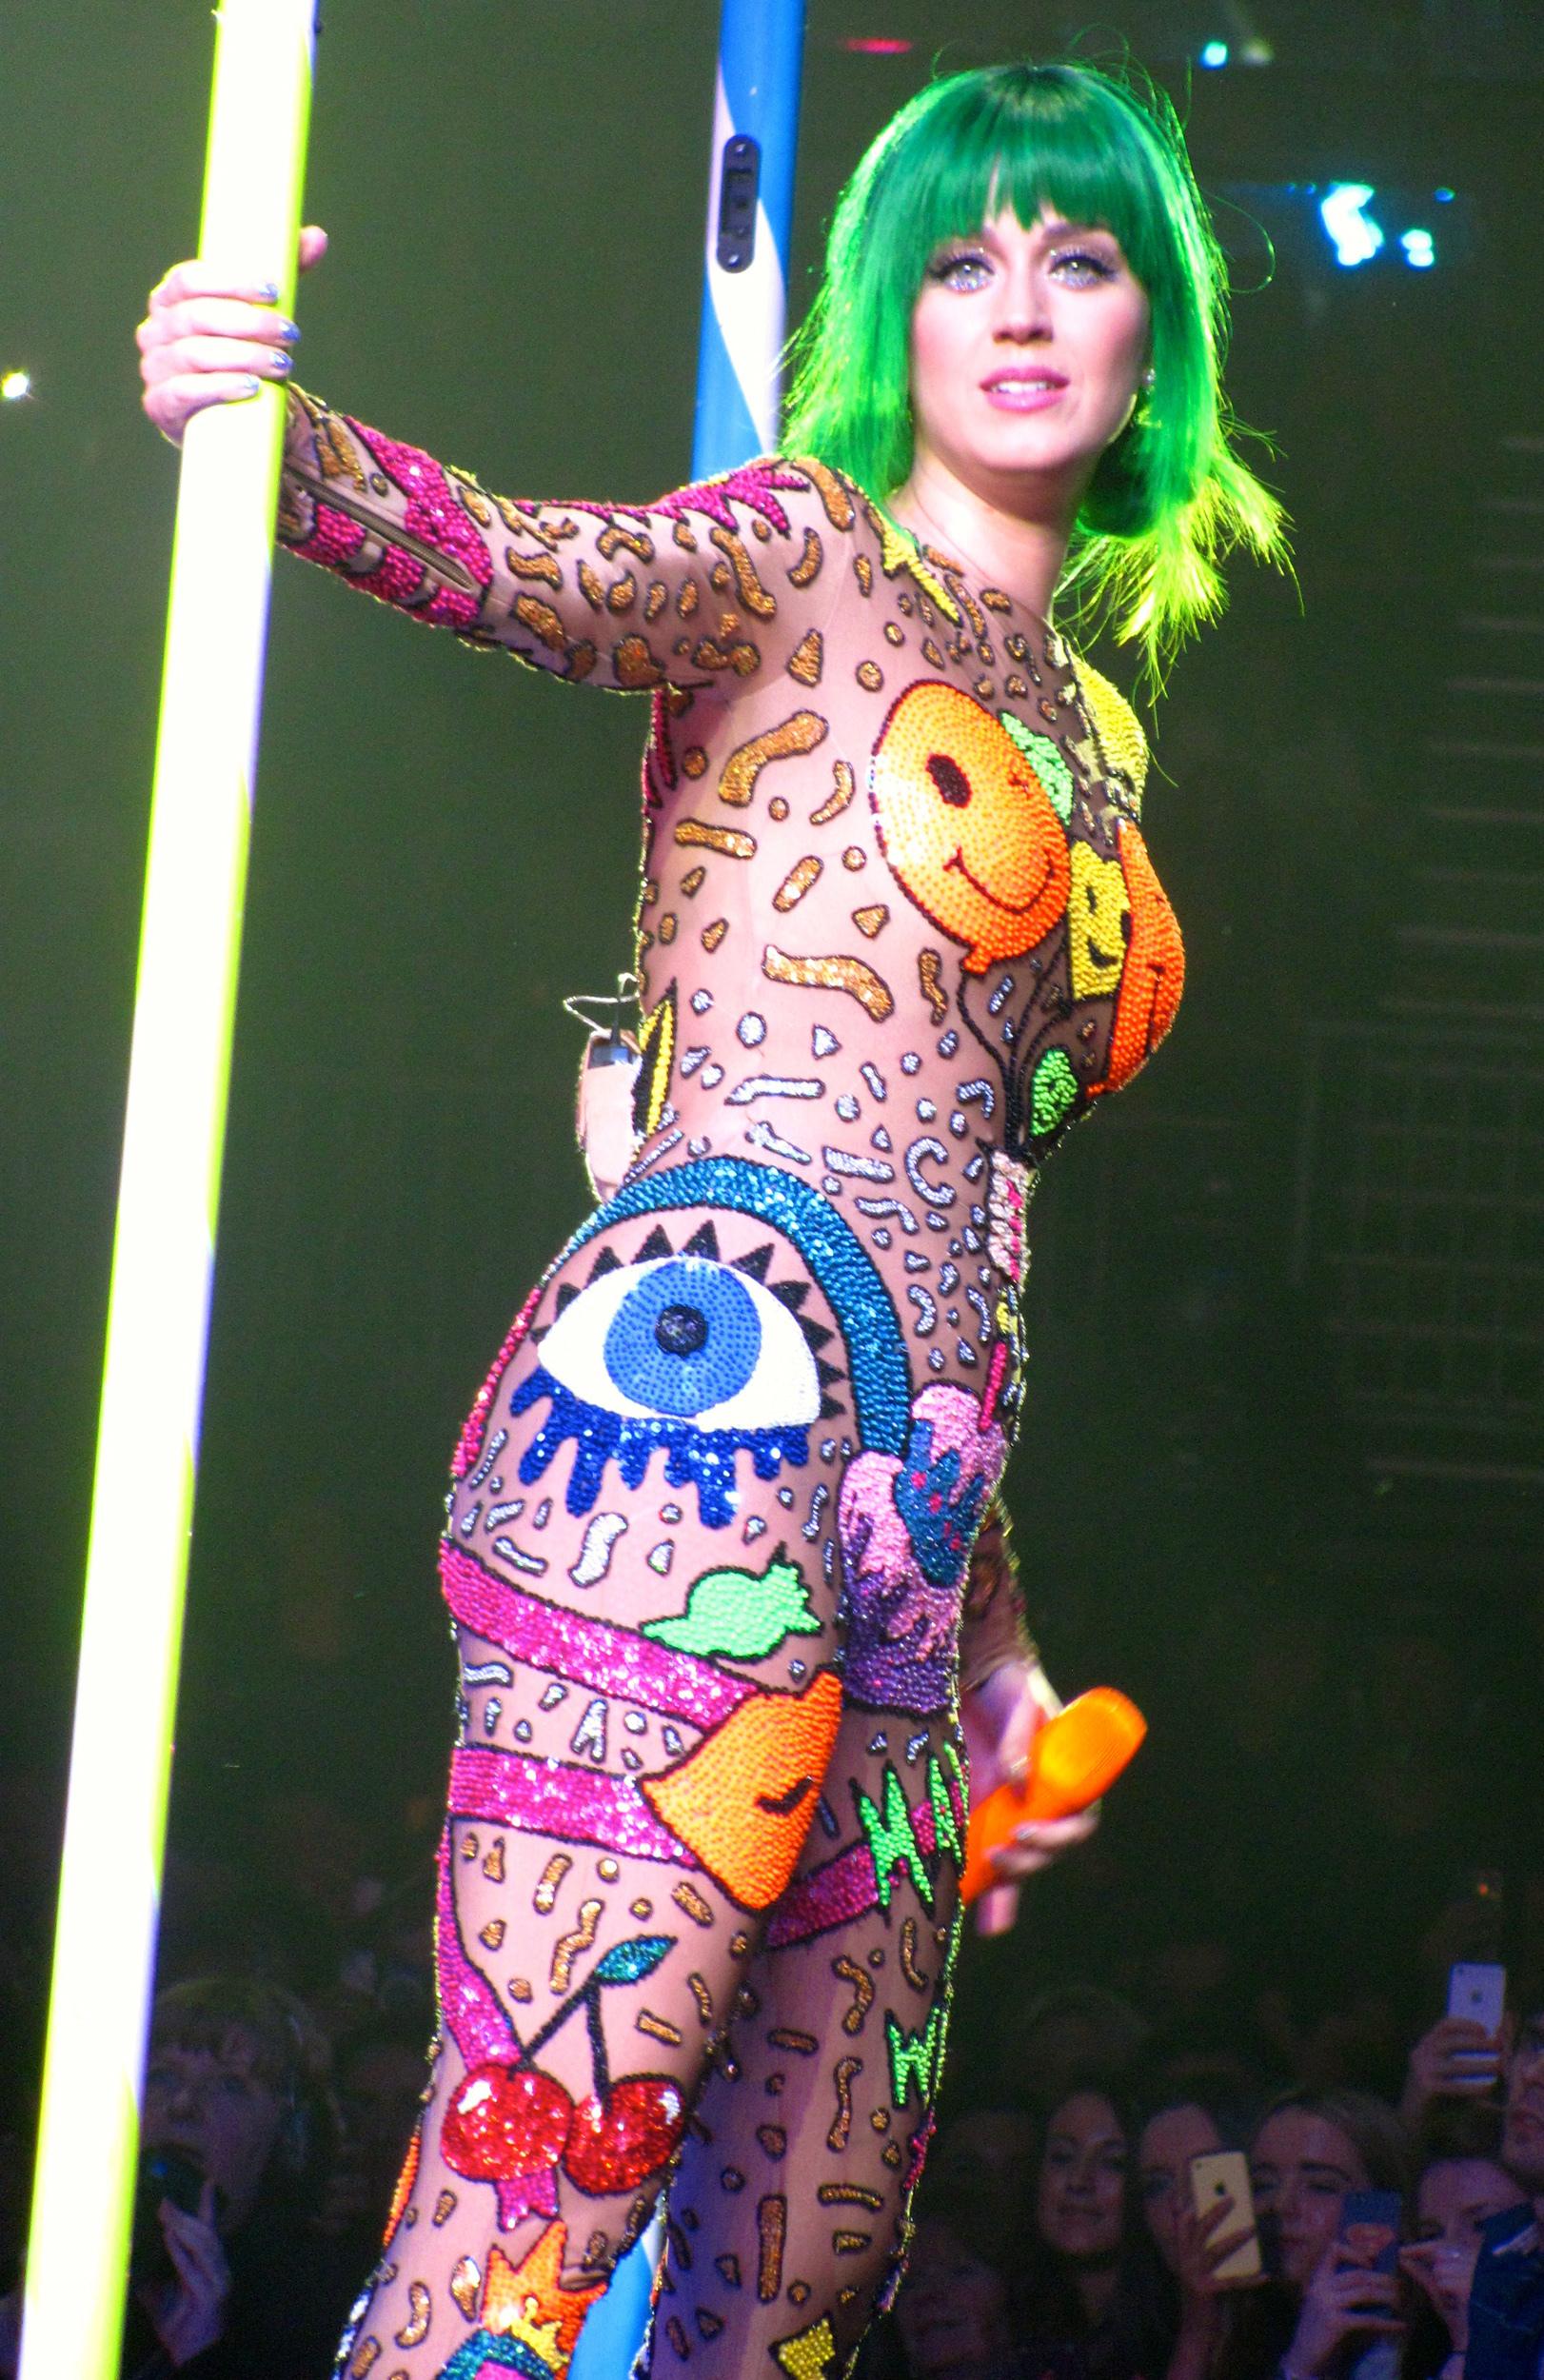 katy perry tour costume